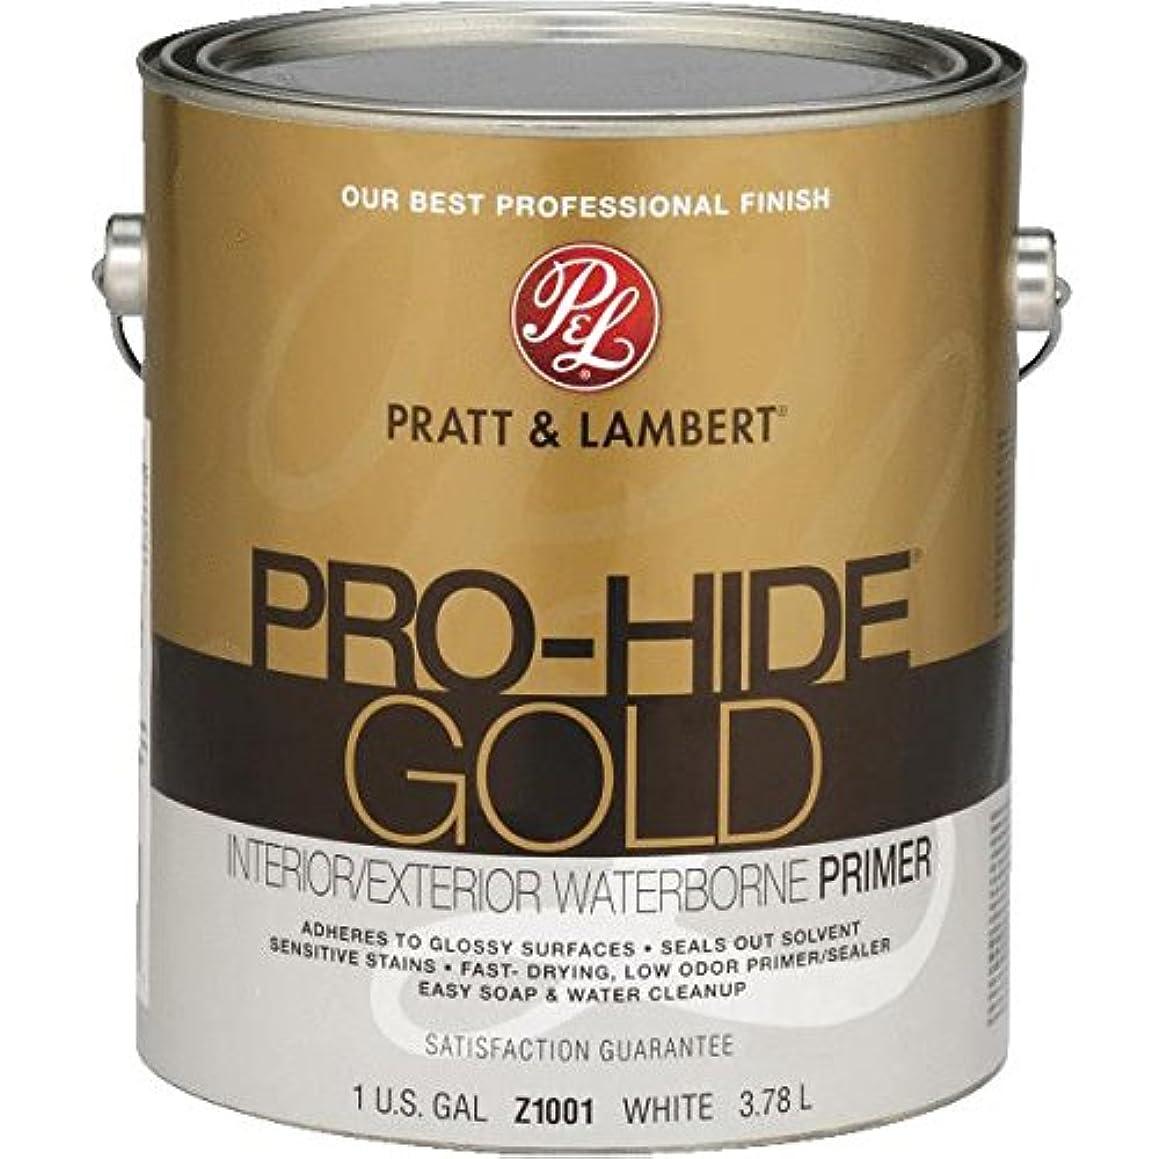 Pratt & Lambert Pro-Hide Gold Interior And Exterior Stain Blocking Primer